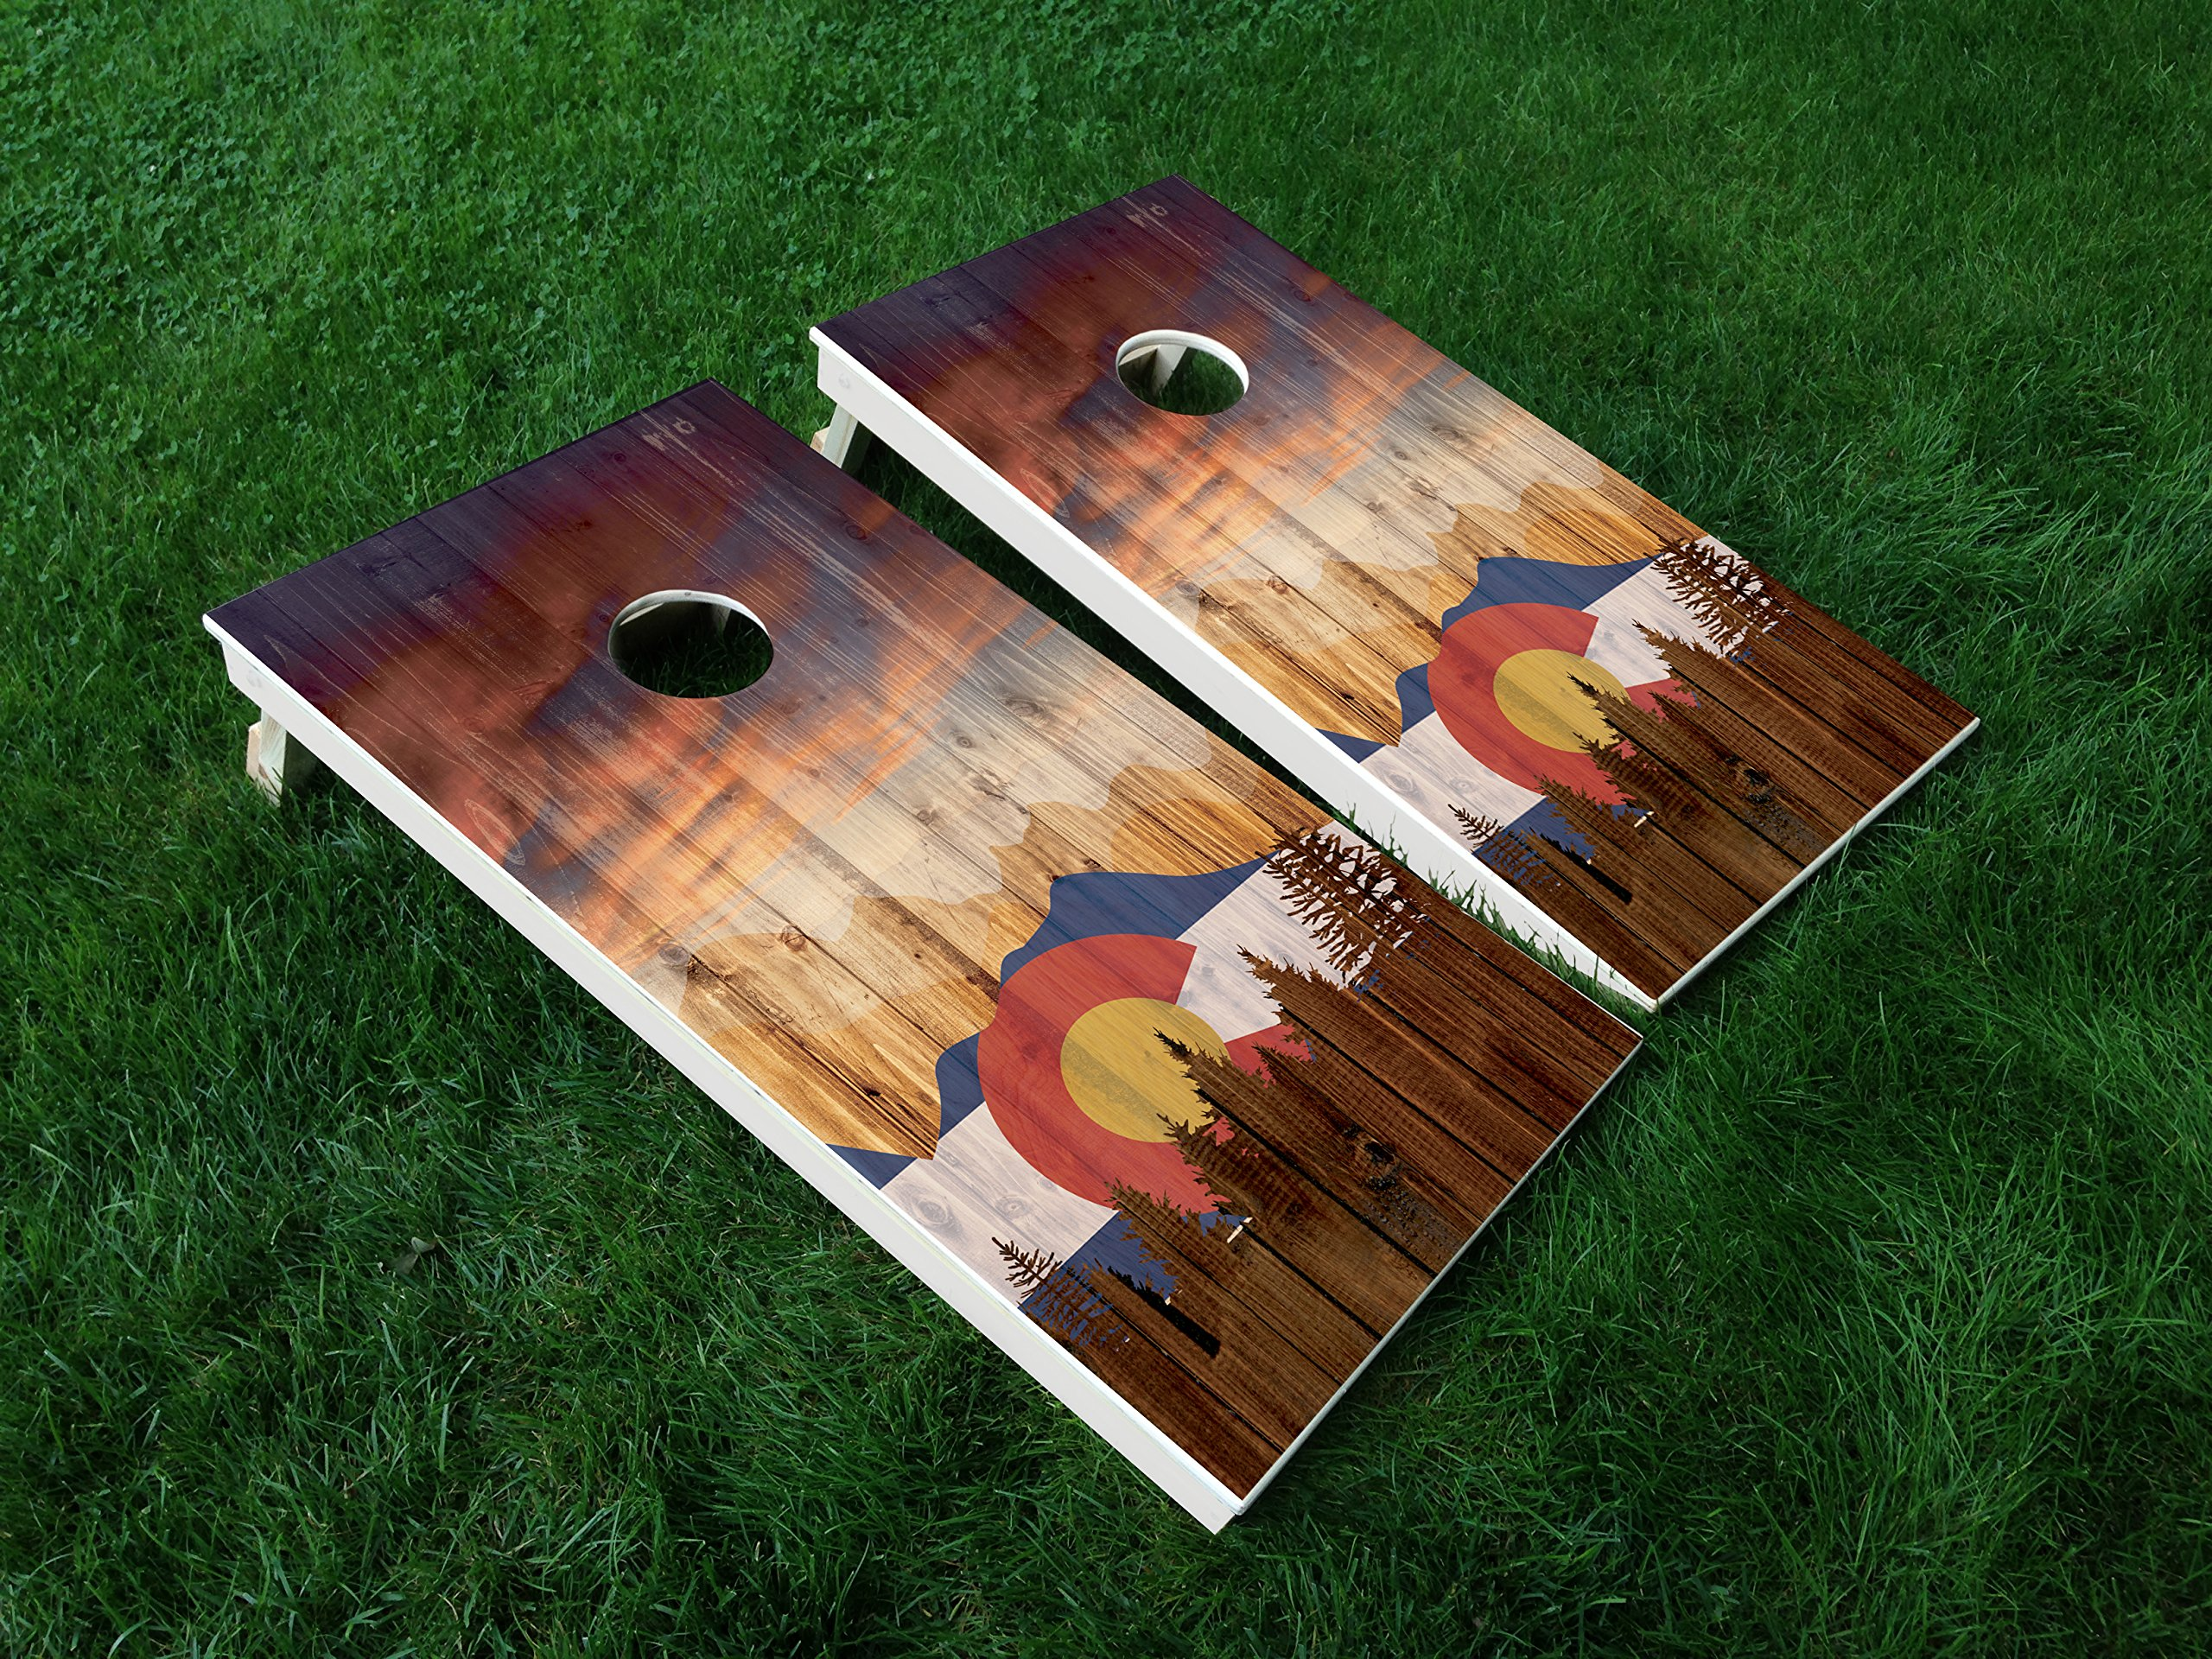 DISTRESSED Colorado 06 Colorado State FLAG CORNHOLE WRAP SET Vinyl Board DECAL Baggo Bag Toss Boards MADE IN the USA by IAWOAVinyl